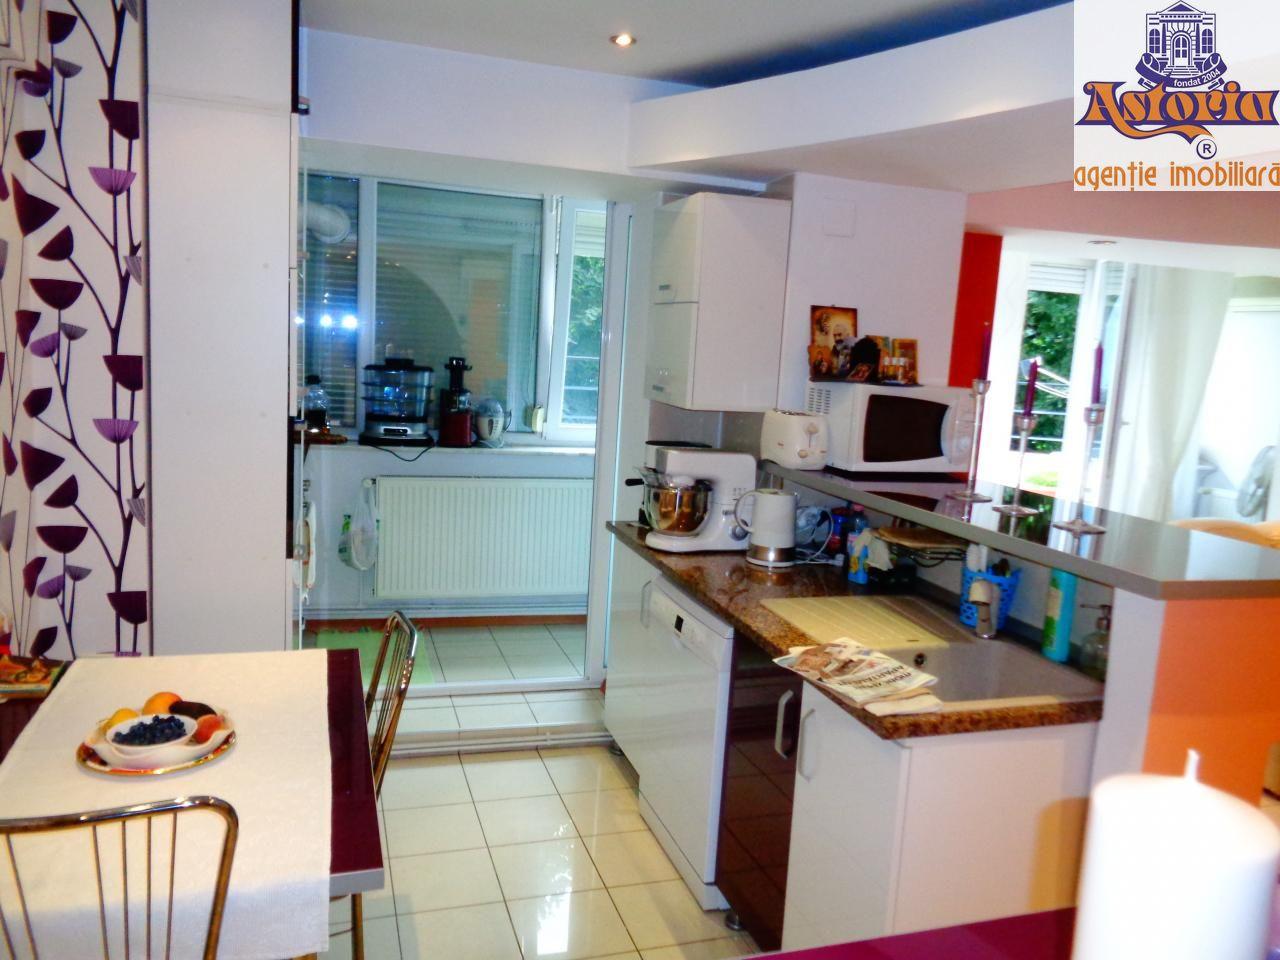 Apartament de vanzare, Pitesti, Arges, Banat - Foto 2